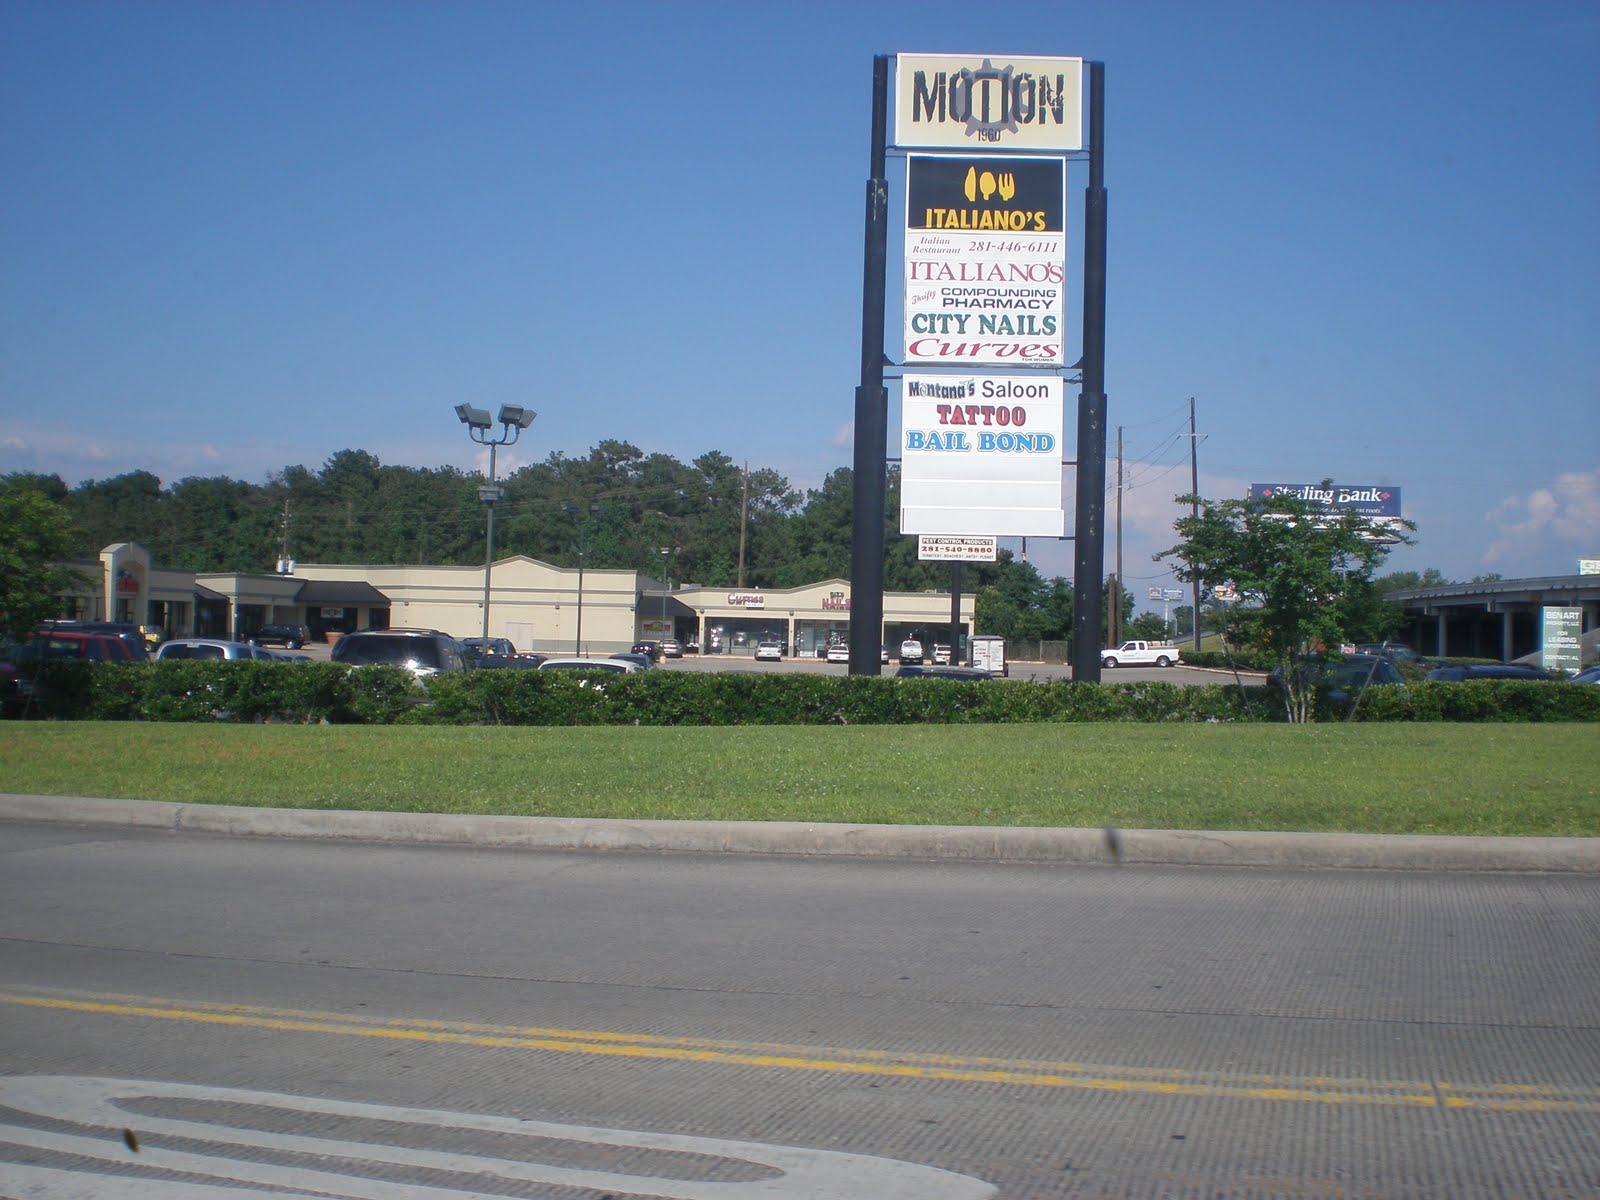 The Louisiana And Texas Retail Blogspot The Retail